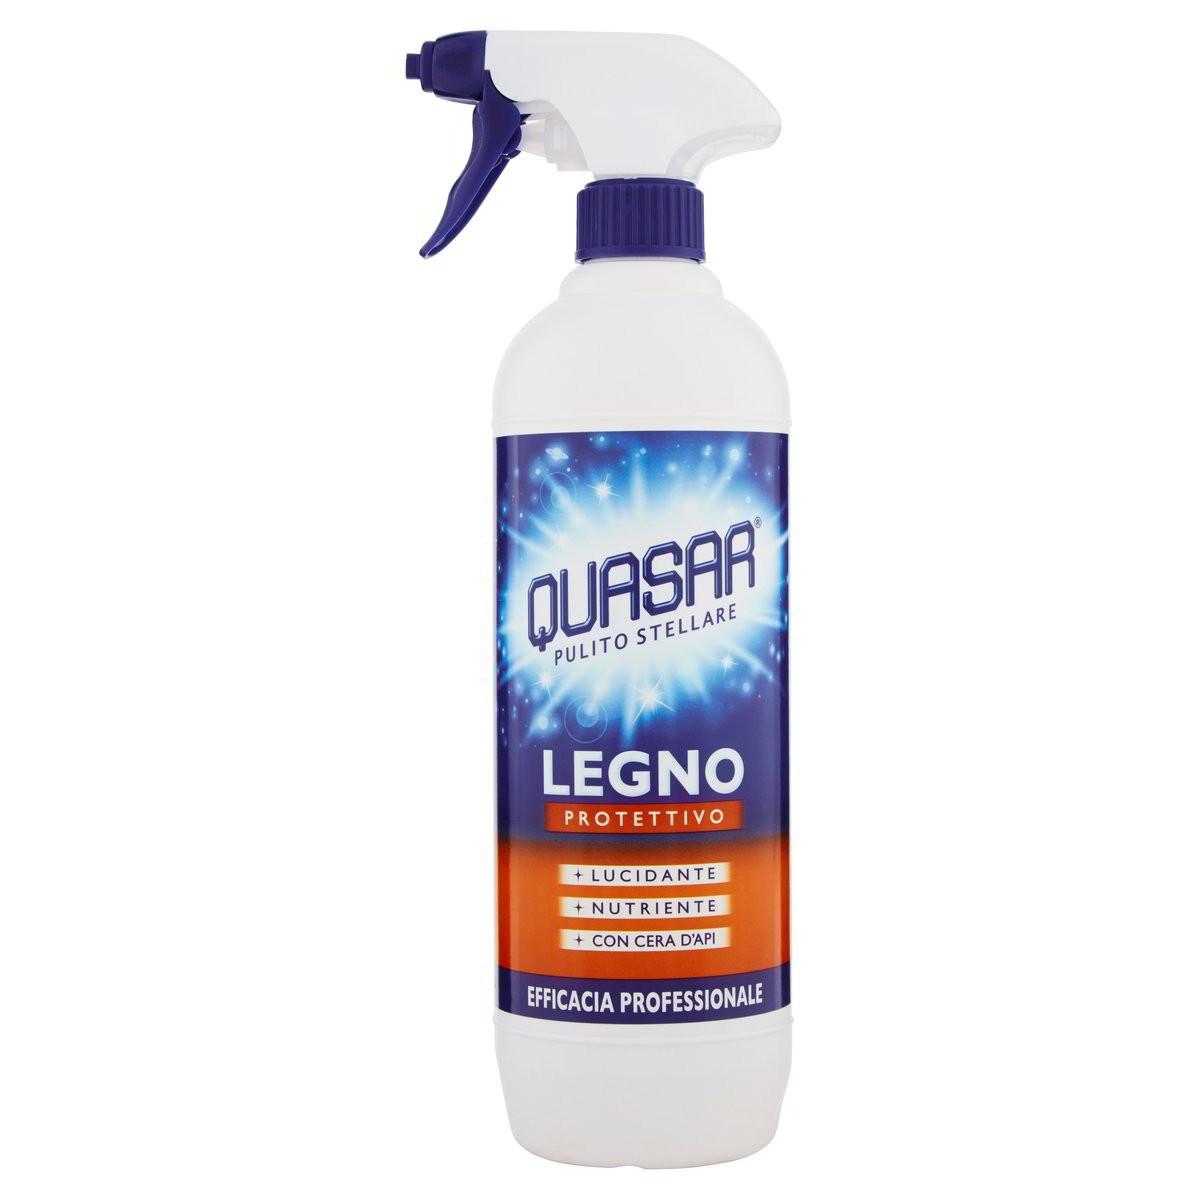 Quasar Detergente spray per legno